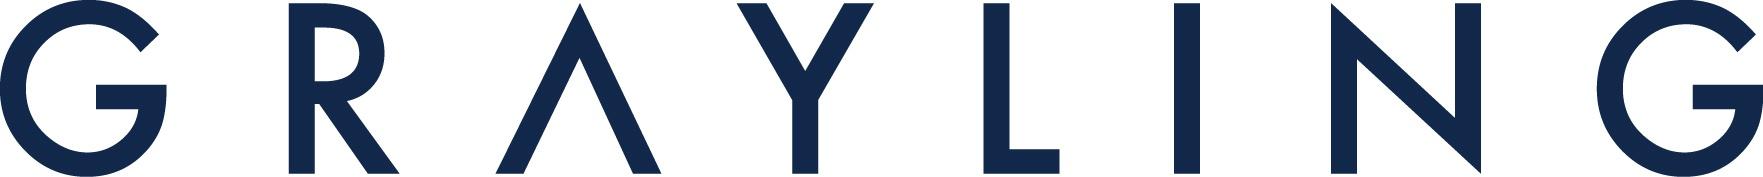 Grayling_Logo_RGB.jpg